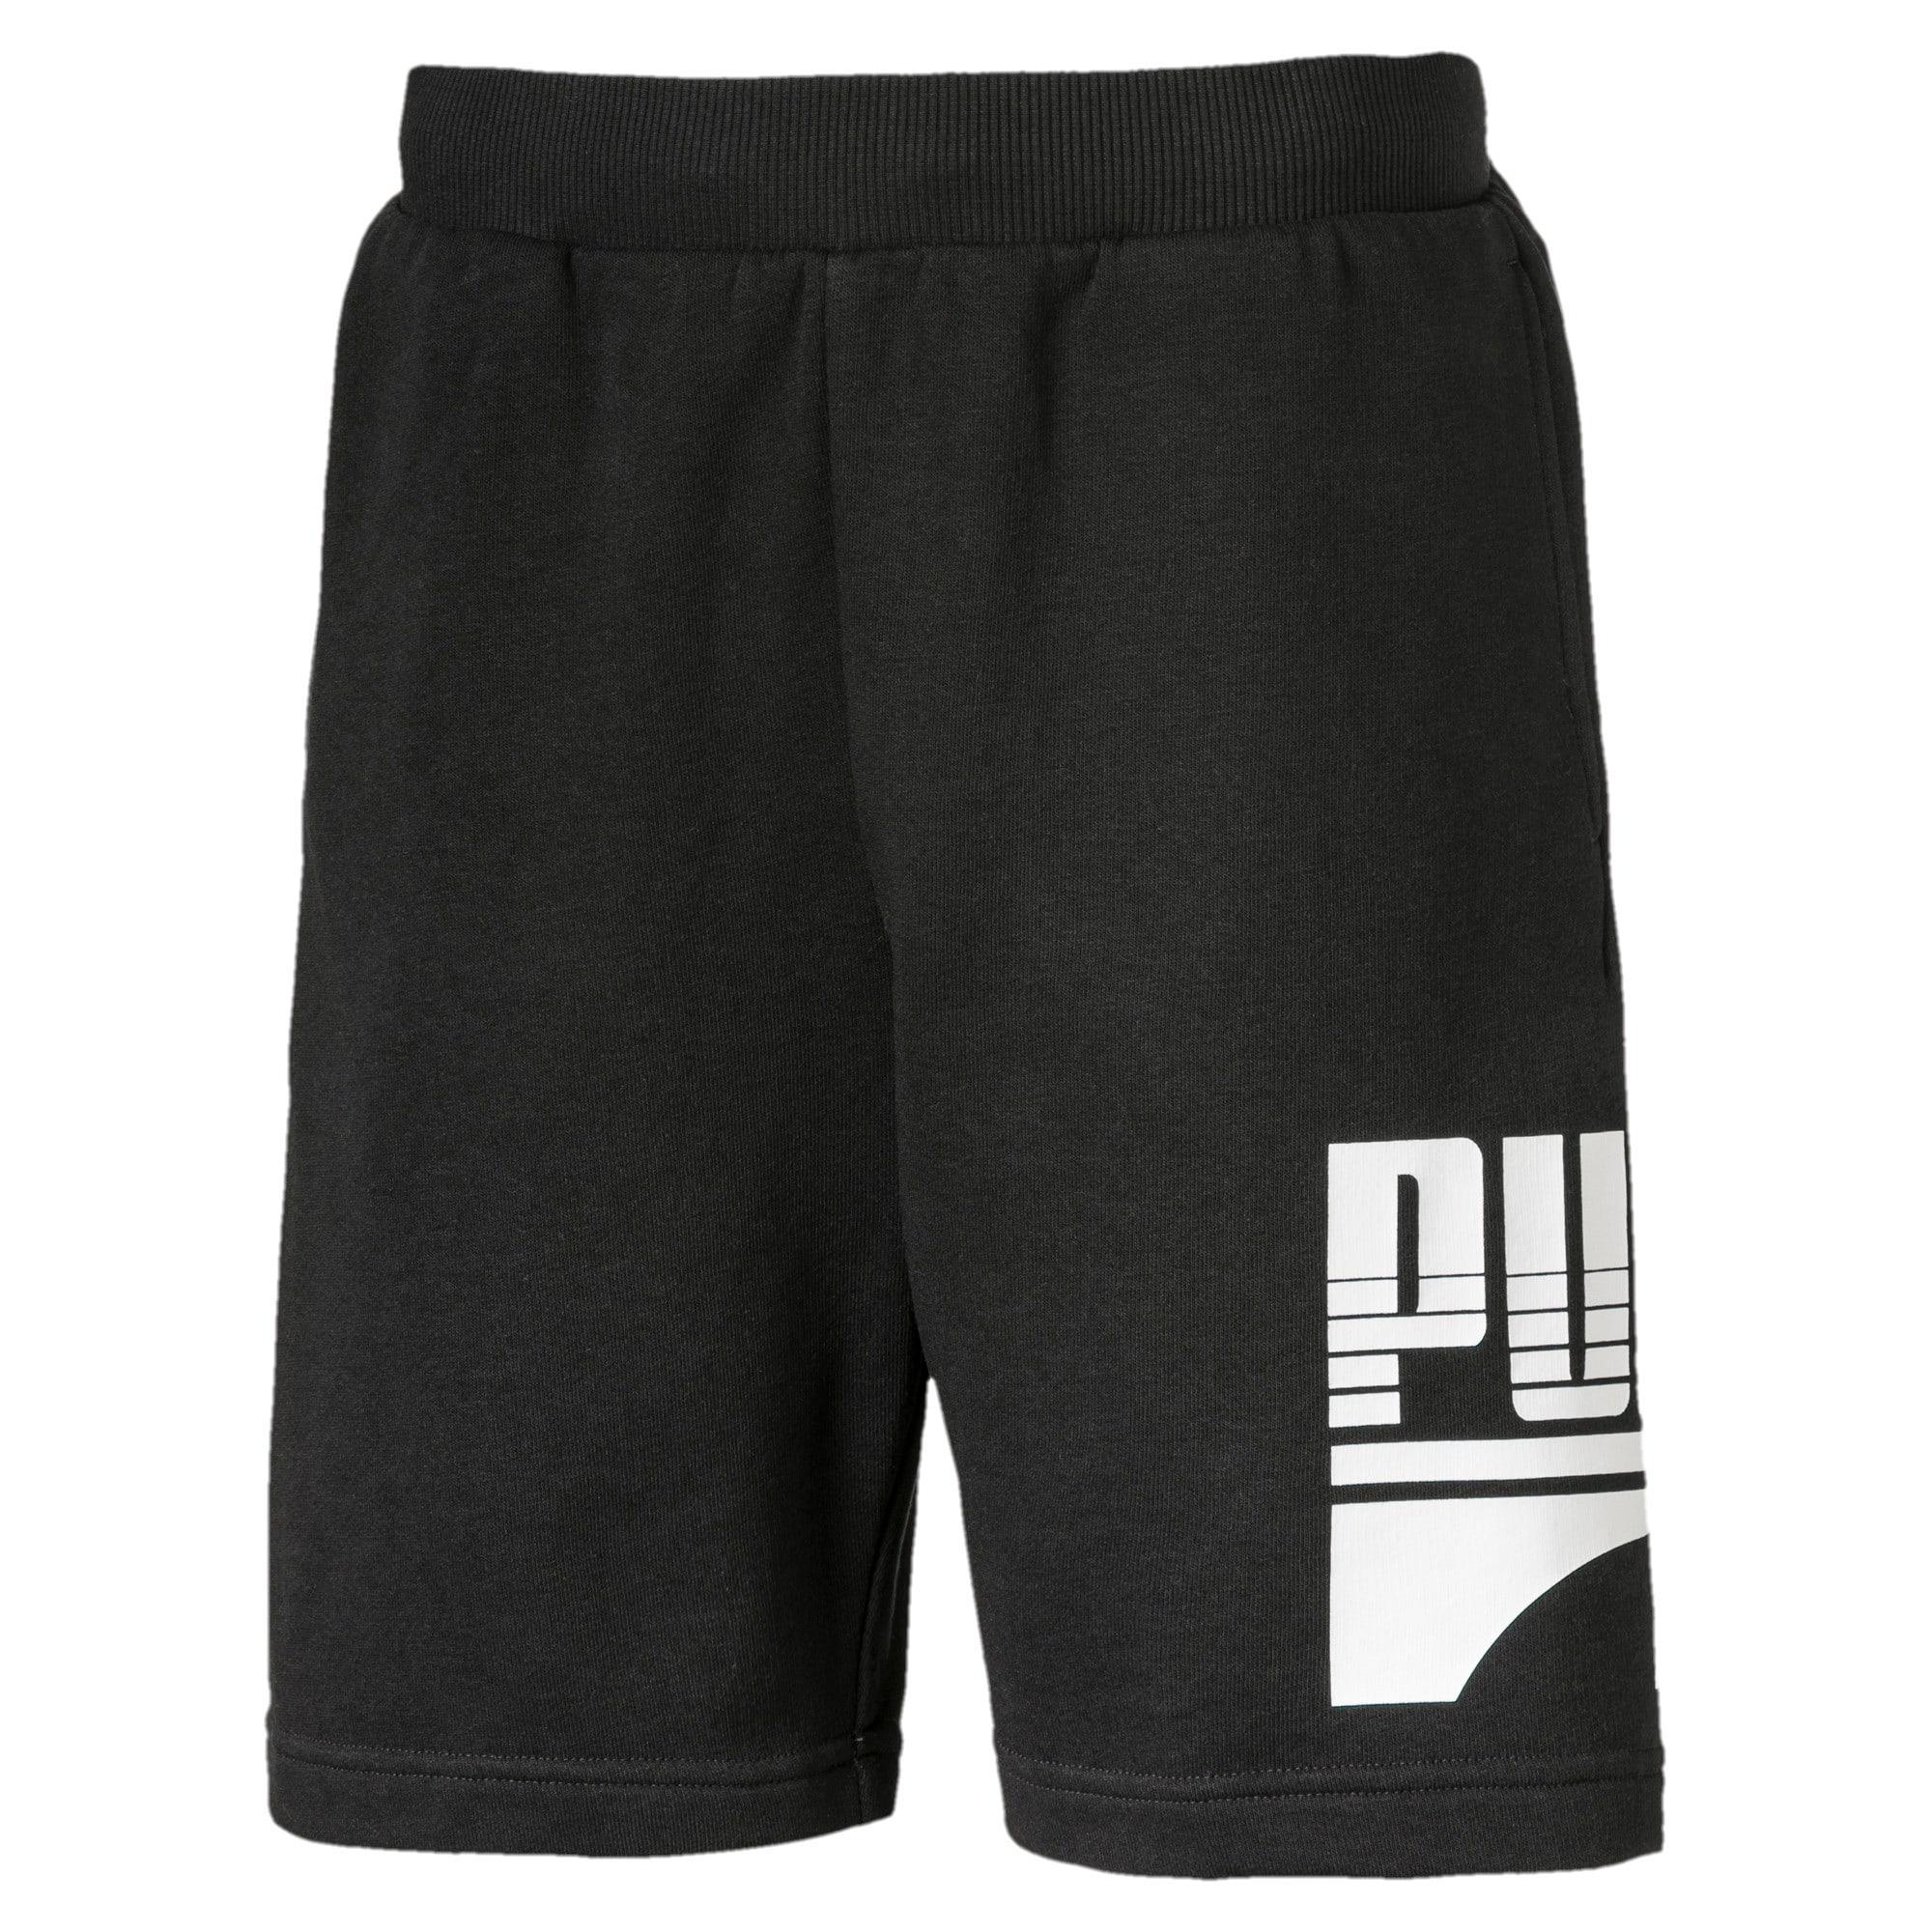 Miniatura 1 de Shorts deportivos Rebel JR, Puma Black, mediano